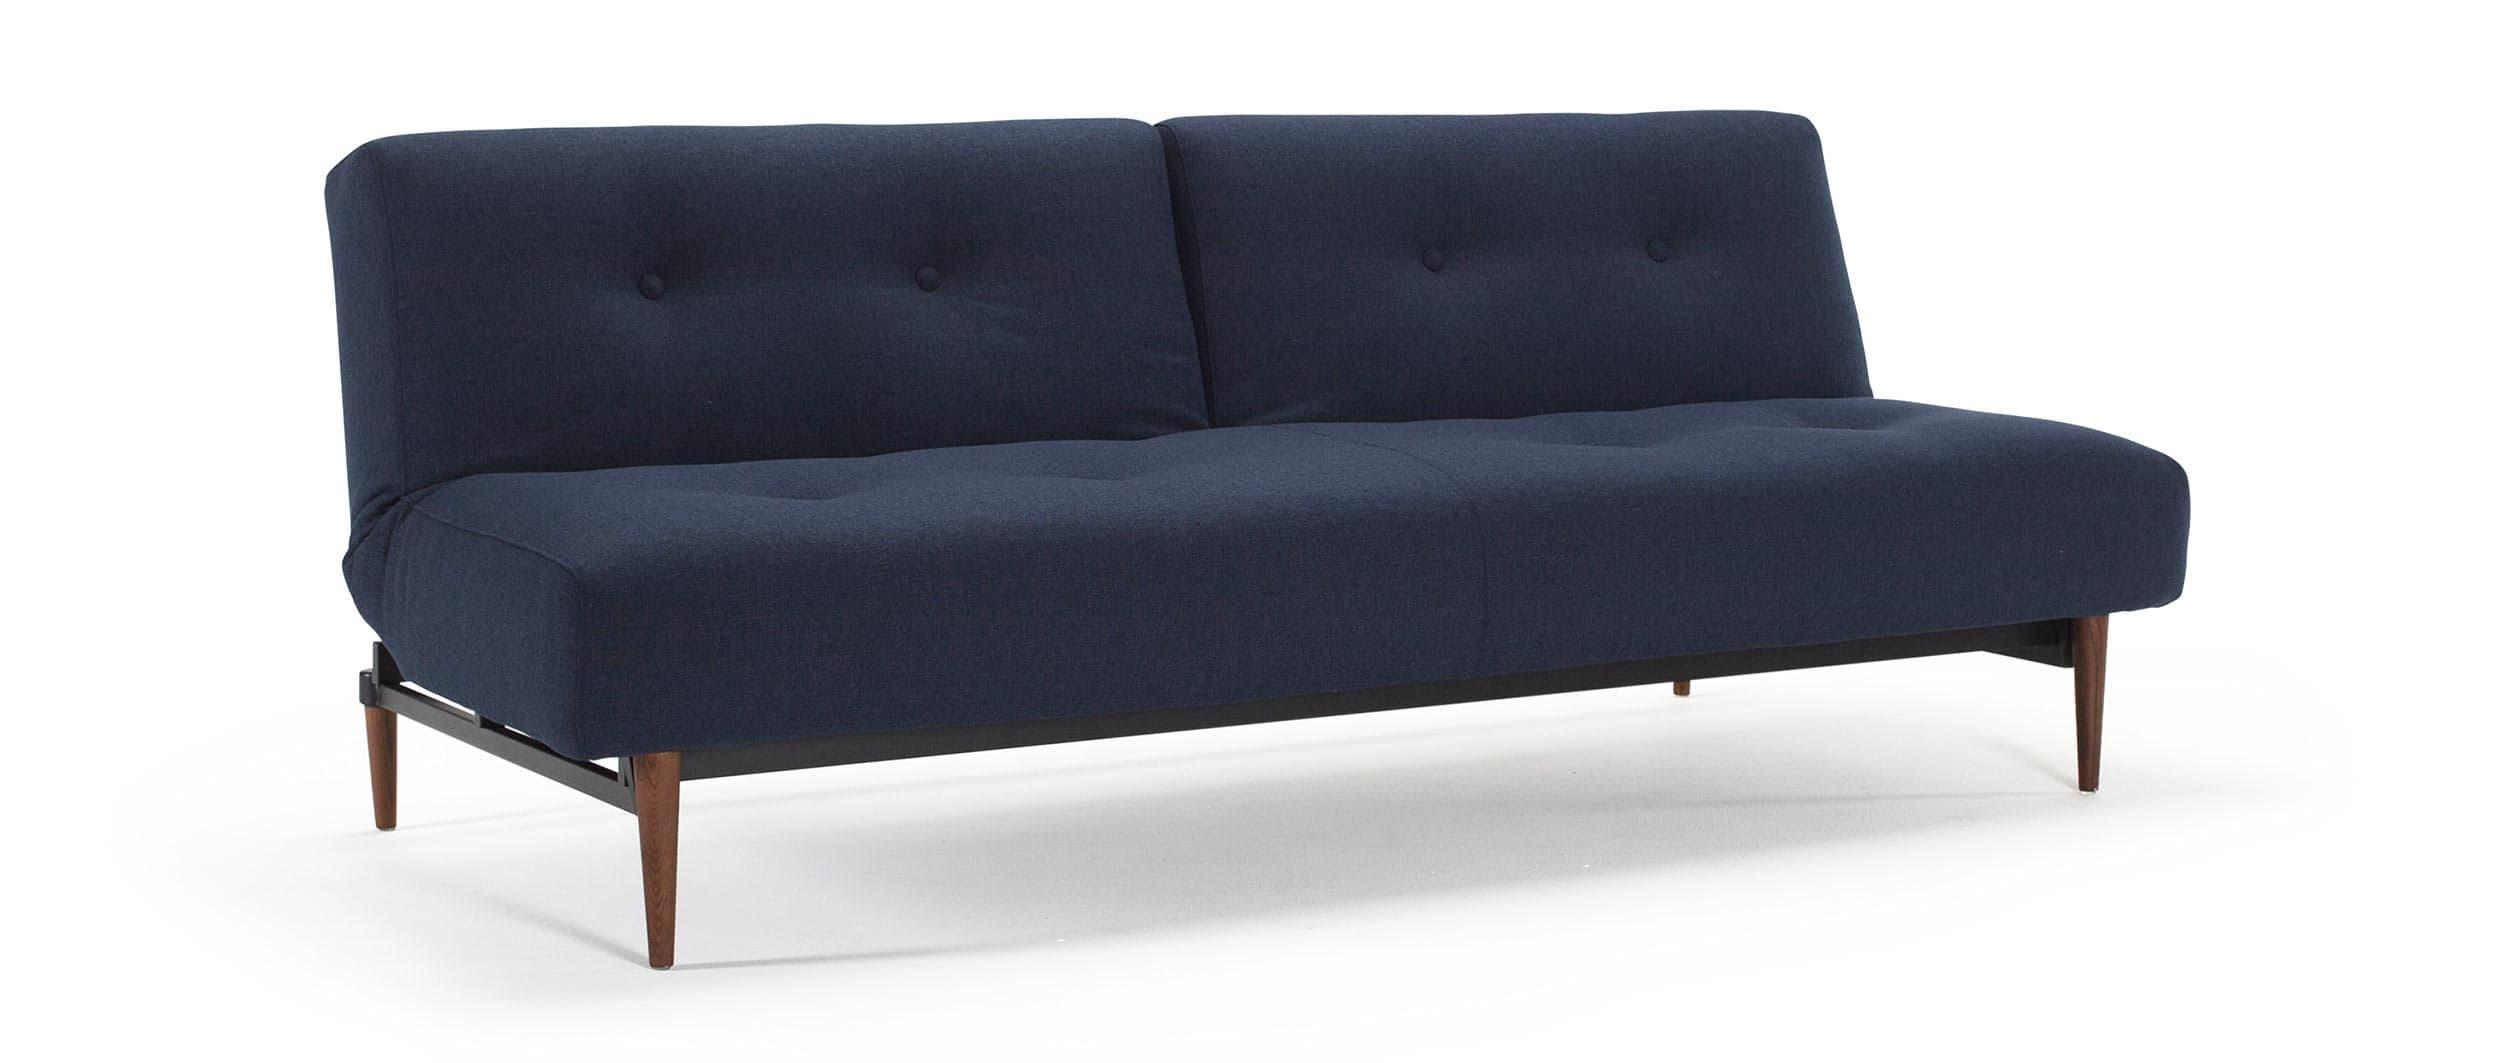 Sofa mit Schlaffunktion BURI von Innovation - Wood, Chrom, Frej ...